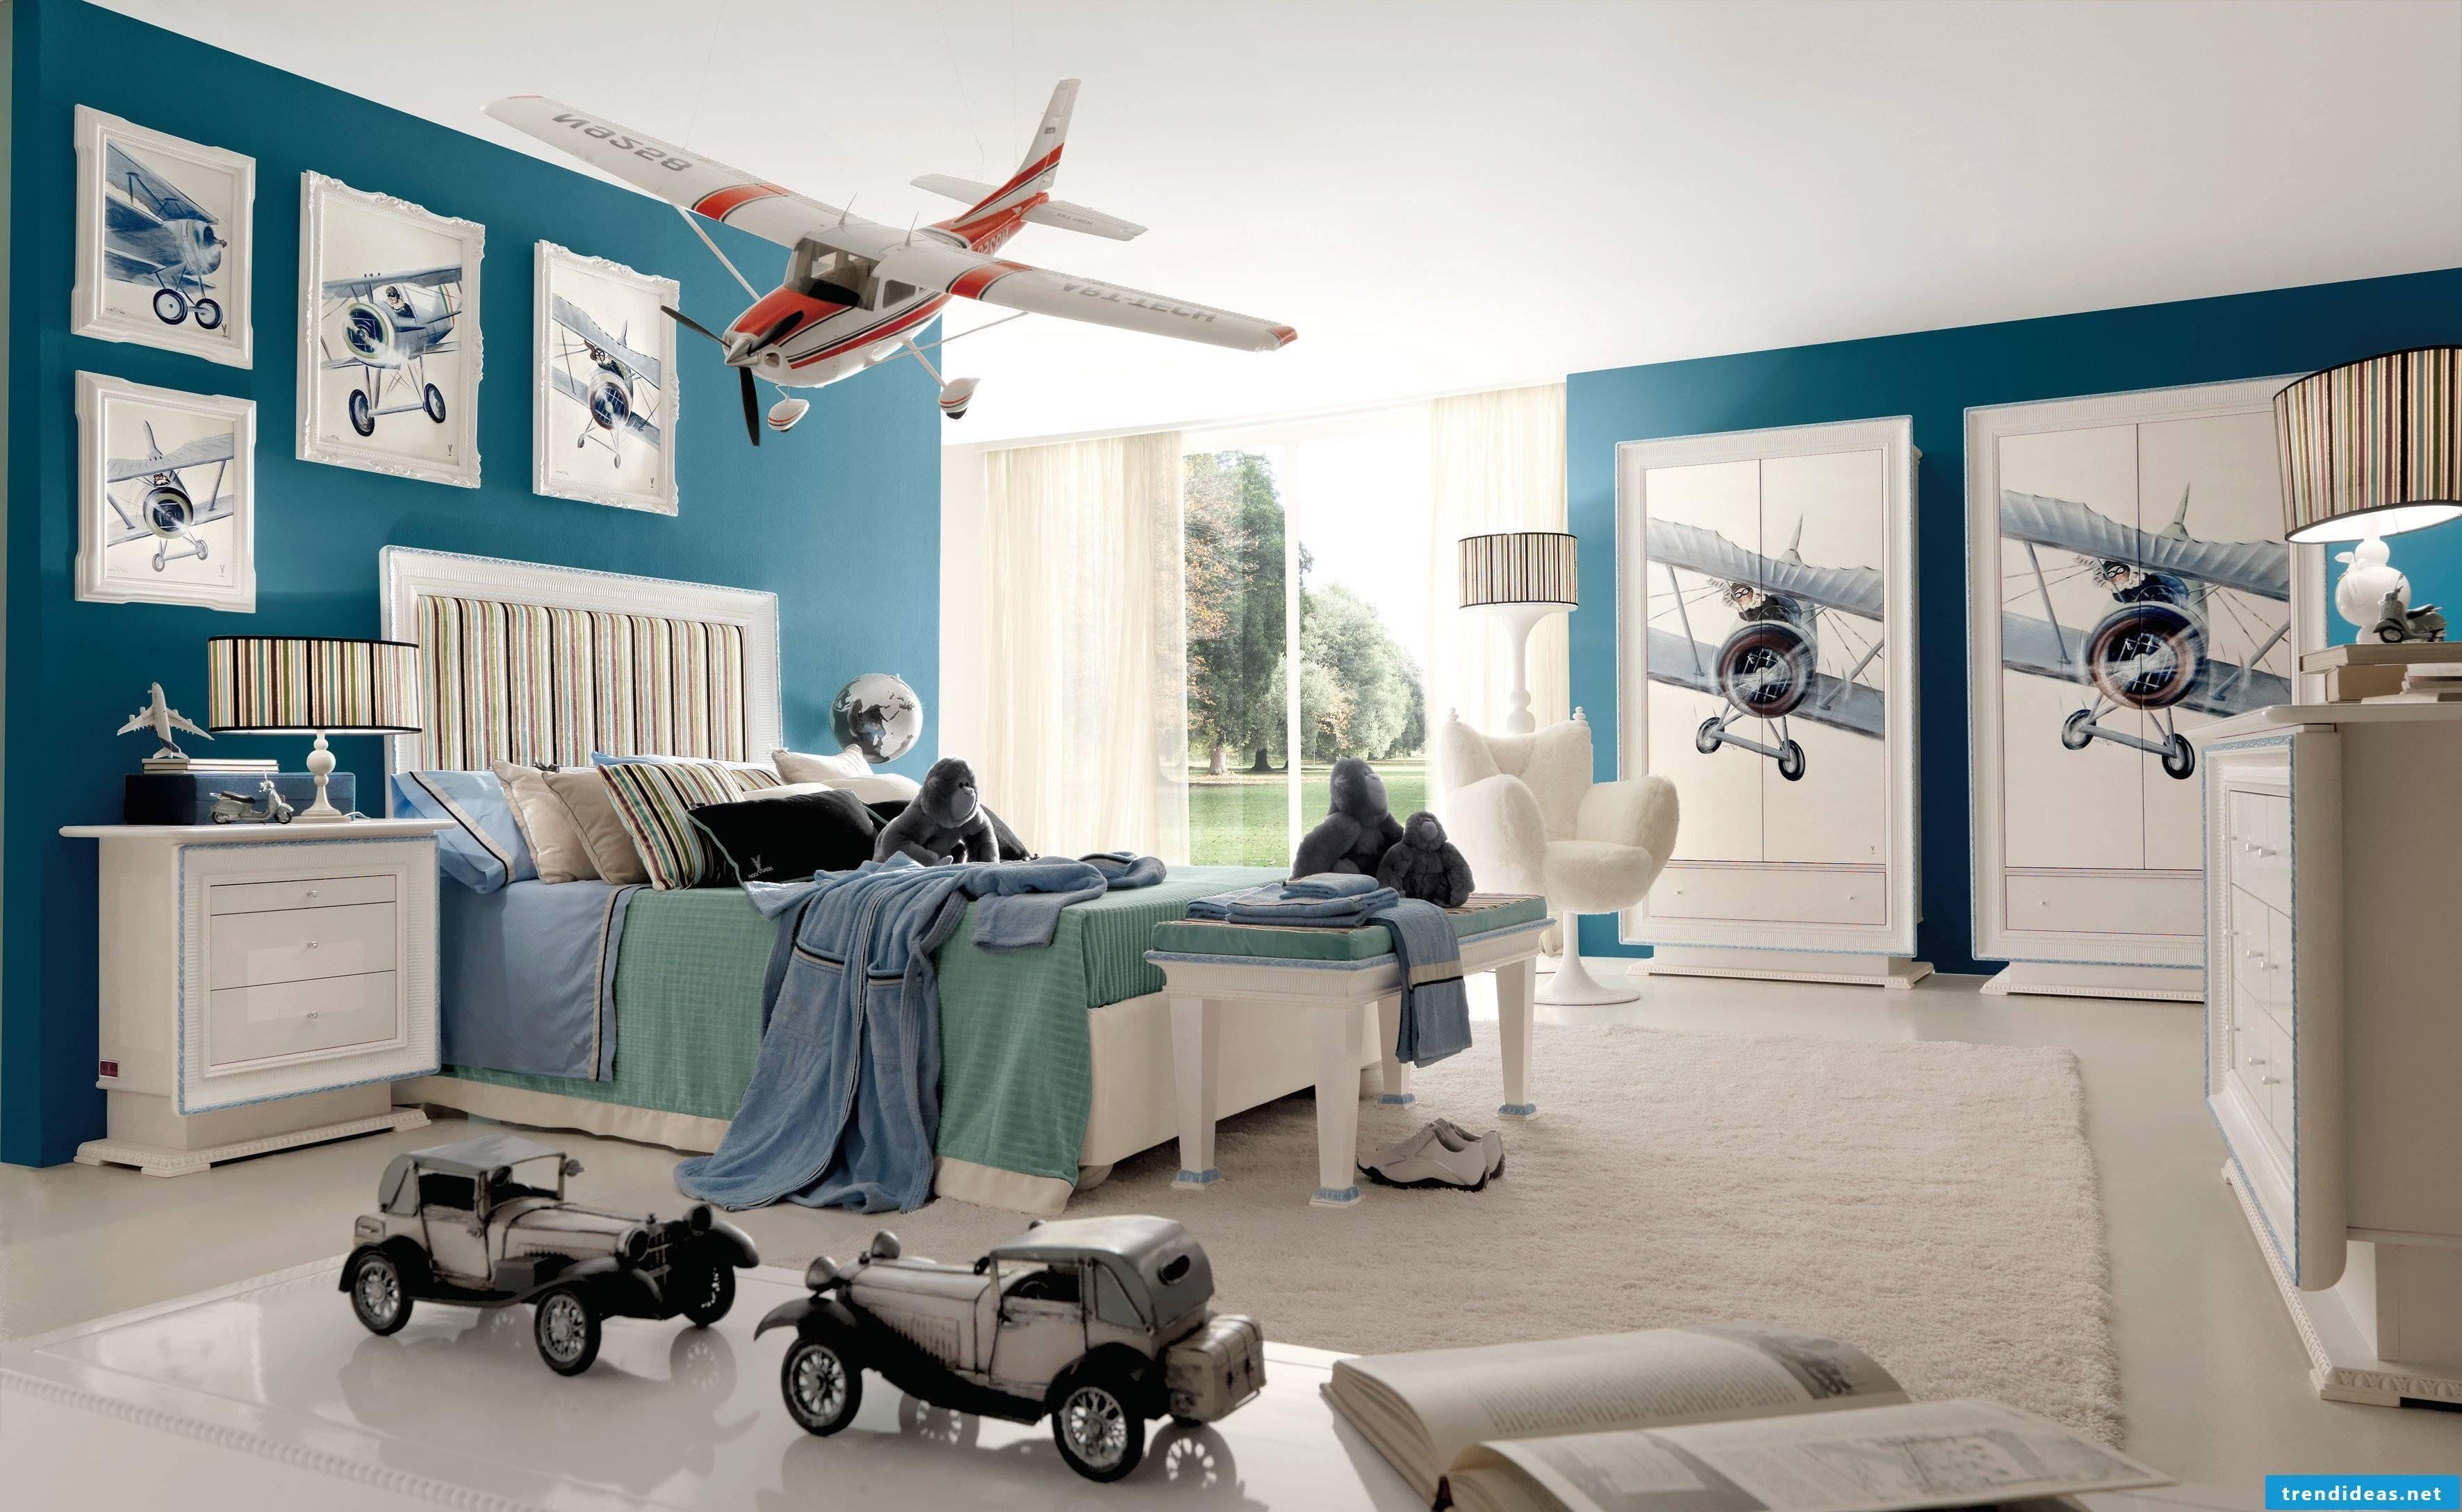 The modern aviator nursery